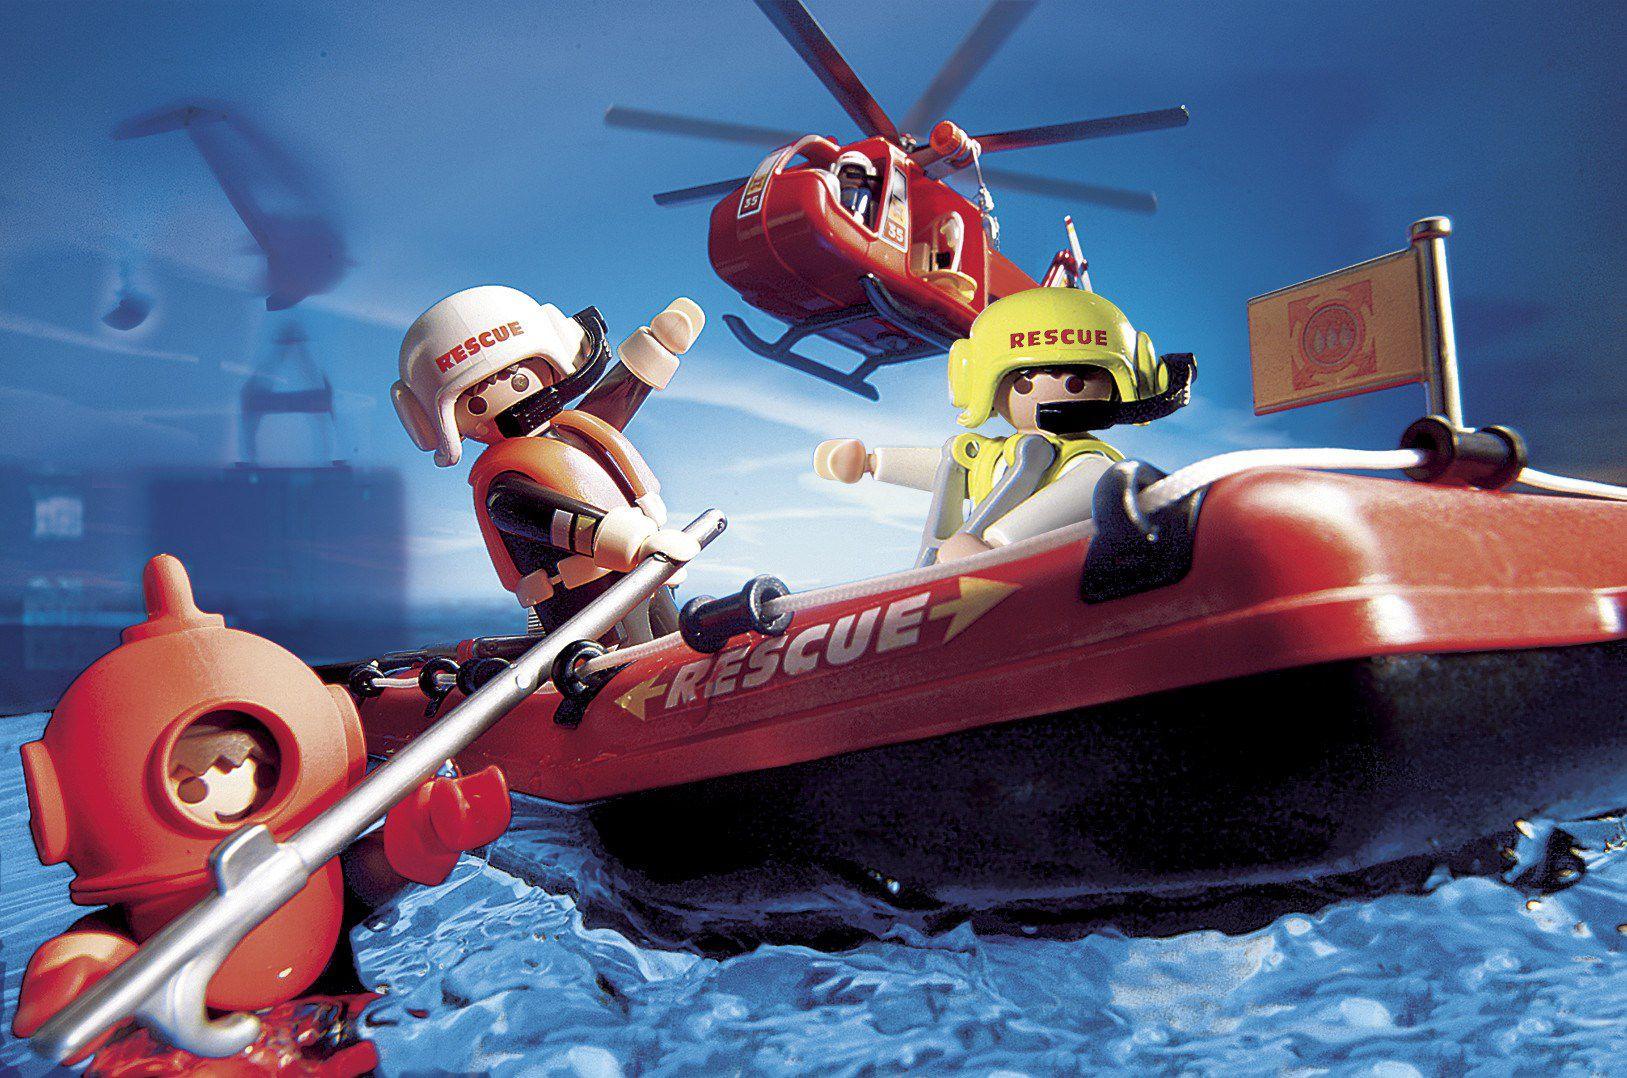 Univers Achat Vente Playmobil 4428 Sauveteurshélicoptèrebateau f6vYyb7g